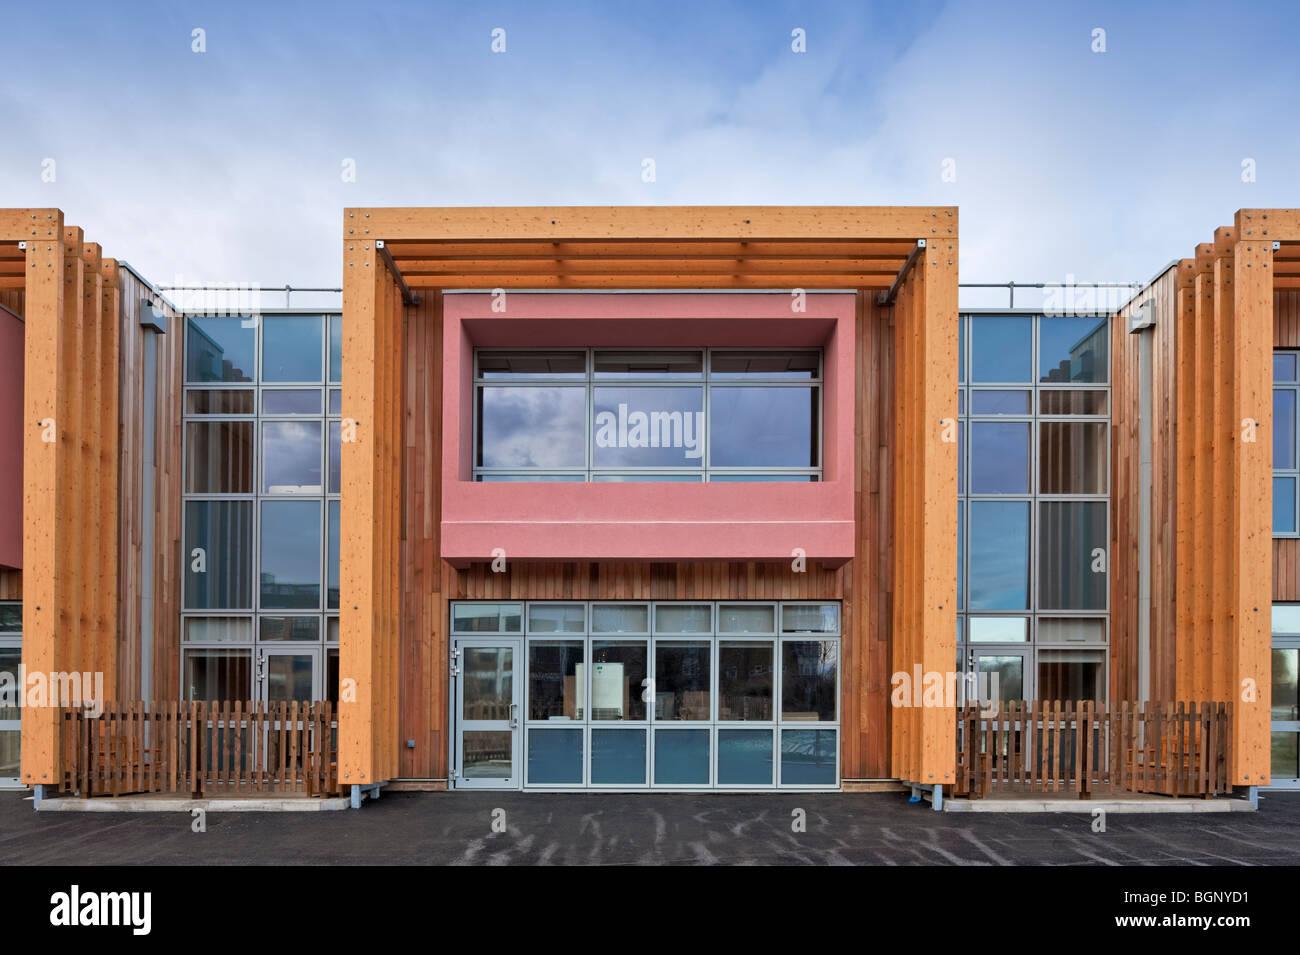 Ben Johnson School in Tower Hamlets, London. - Stock Image